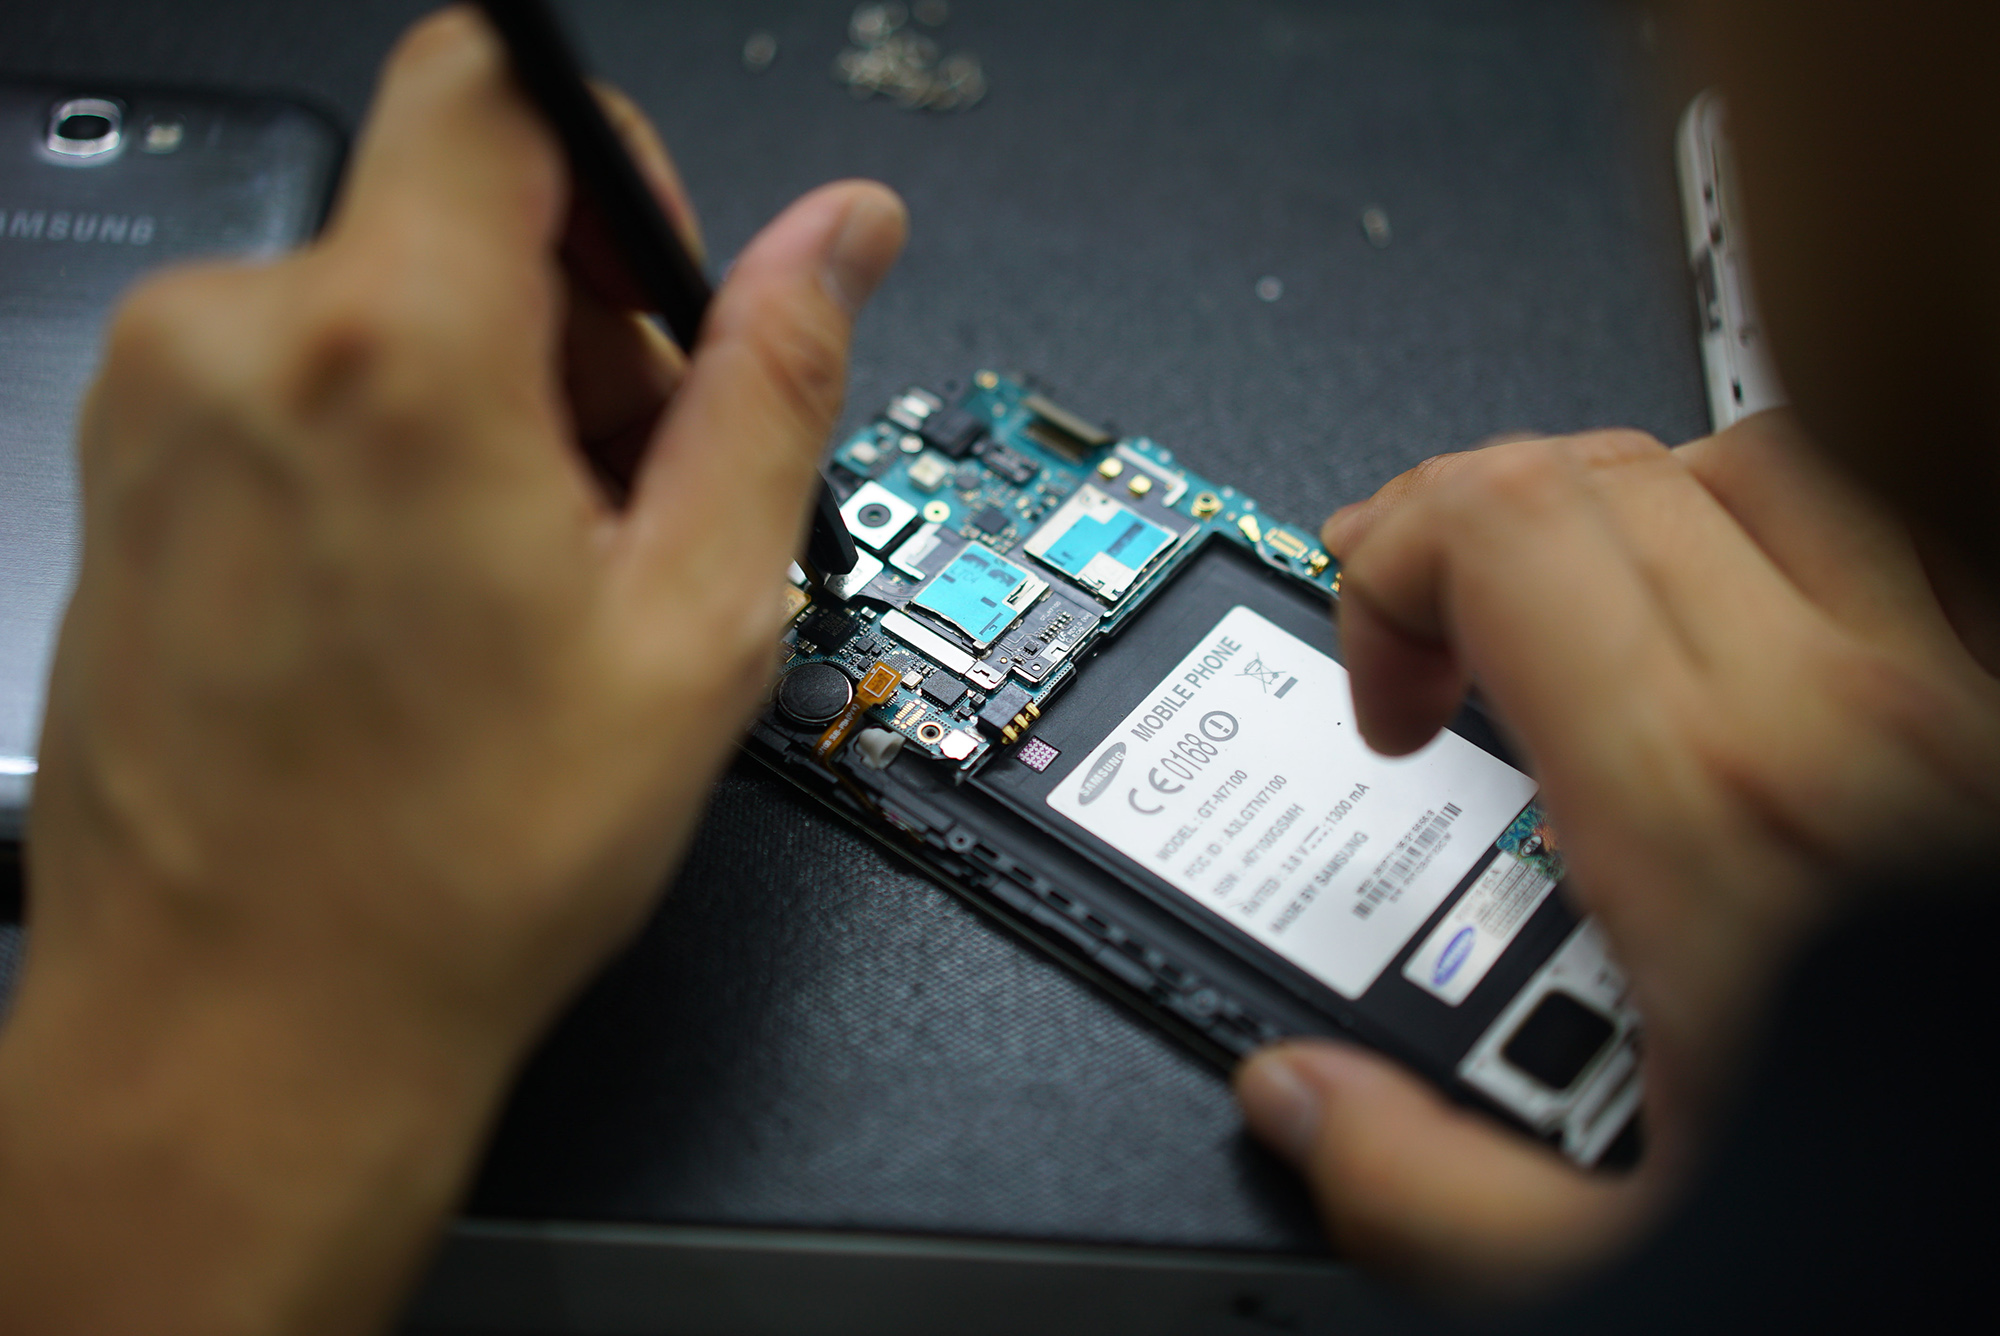 Samsung Boost Efforts To Improve Customer Service Nationwide